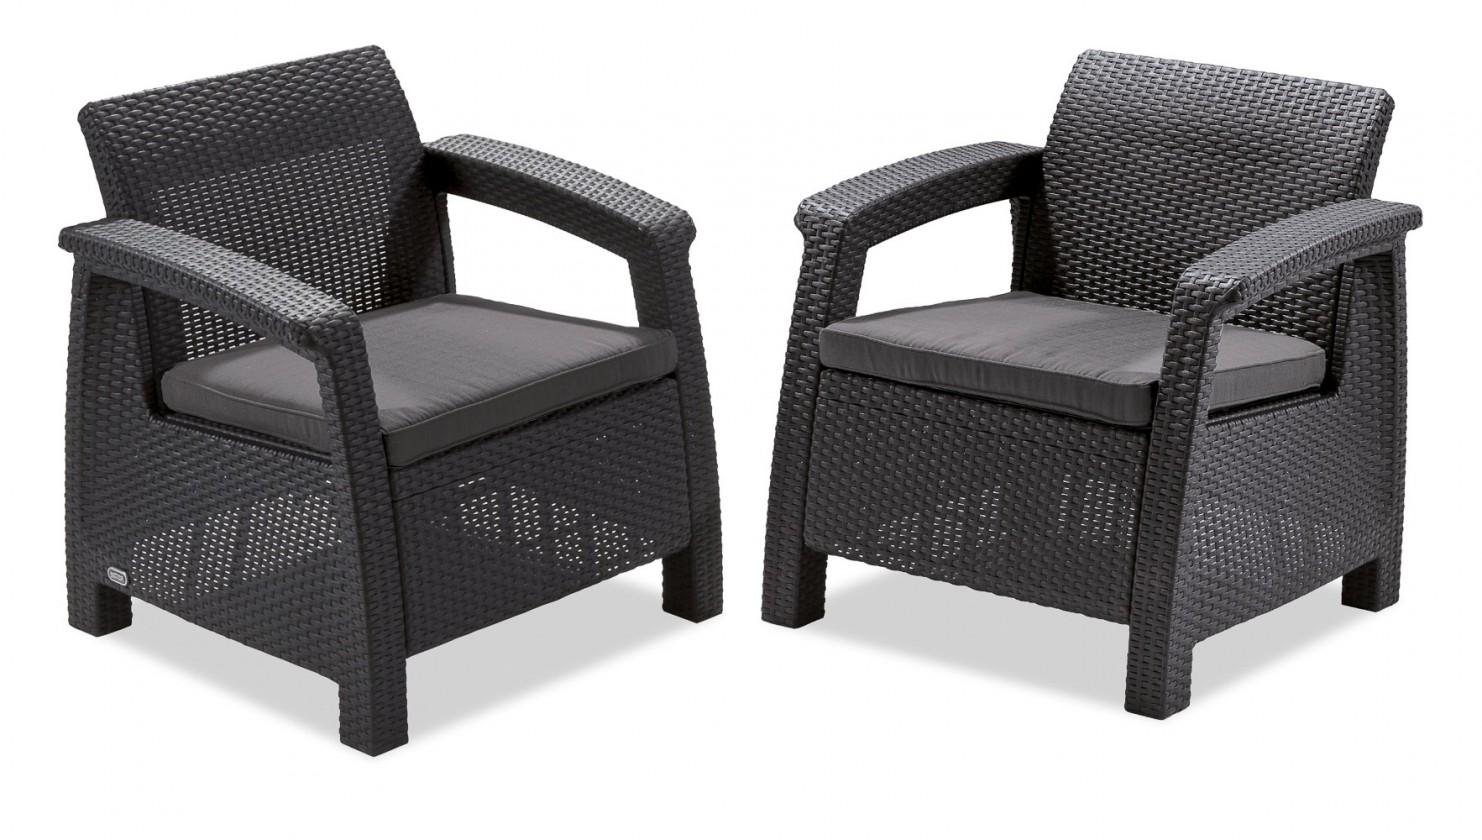 Corfu II - Set Duo (černá, šedá)